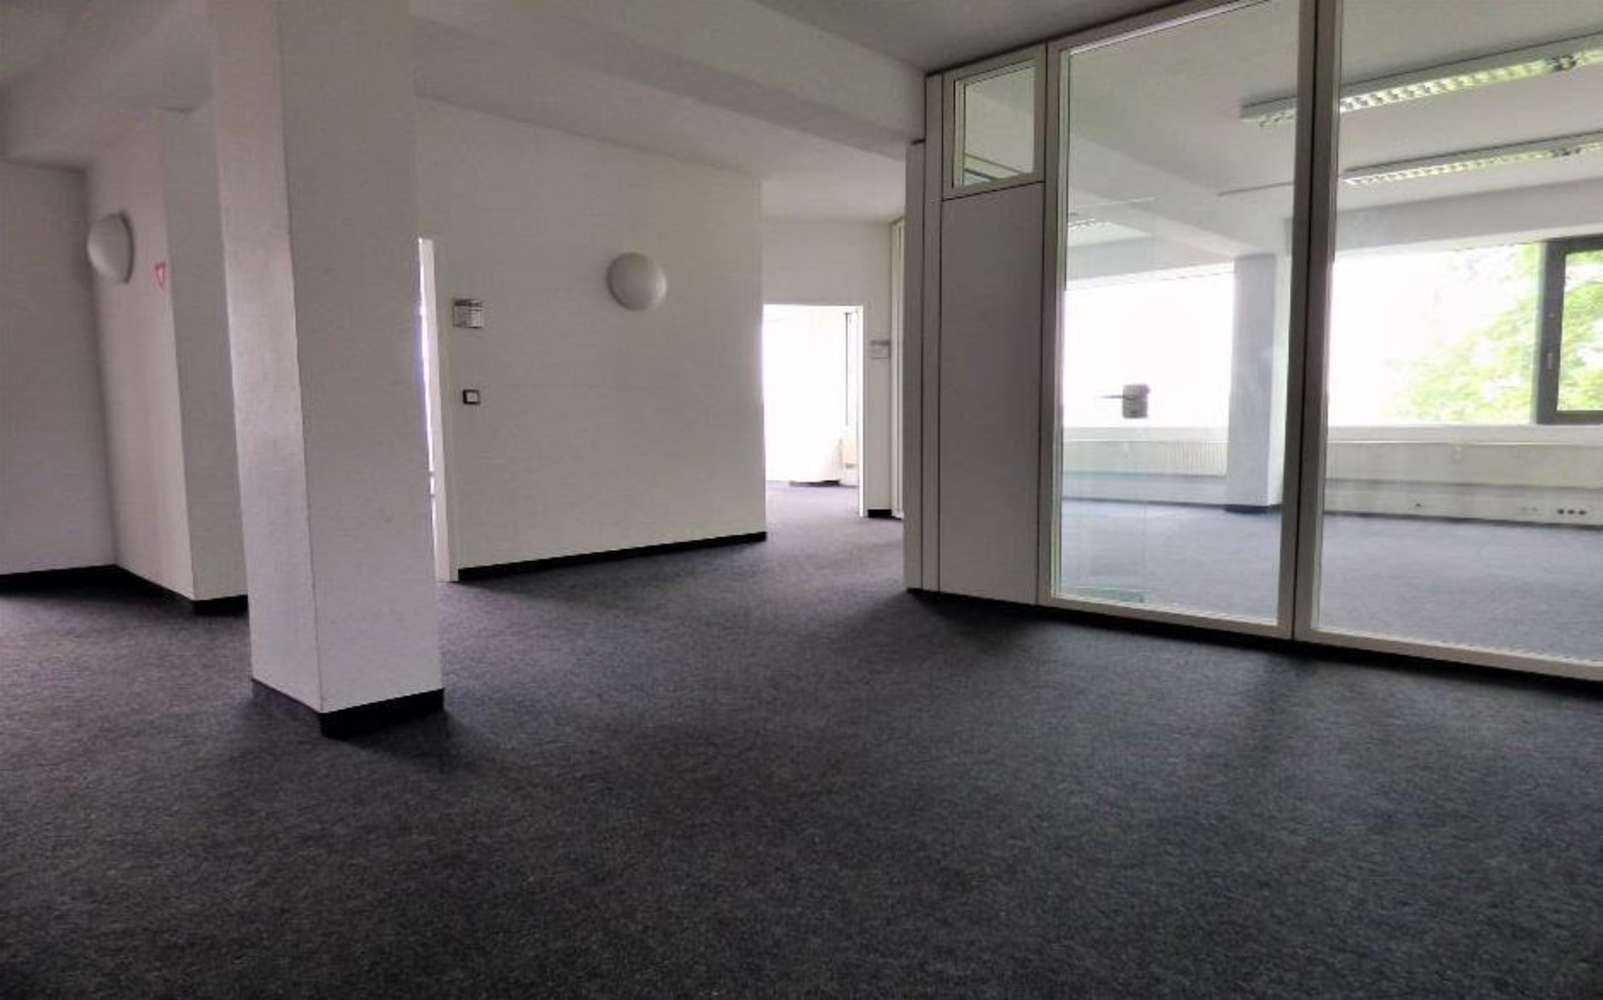 Büros Köln, 50677 - Büro - Köln, Neustadt-Süd - K1050 - 10057743